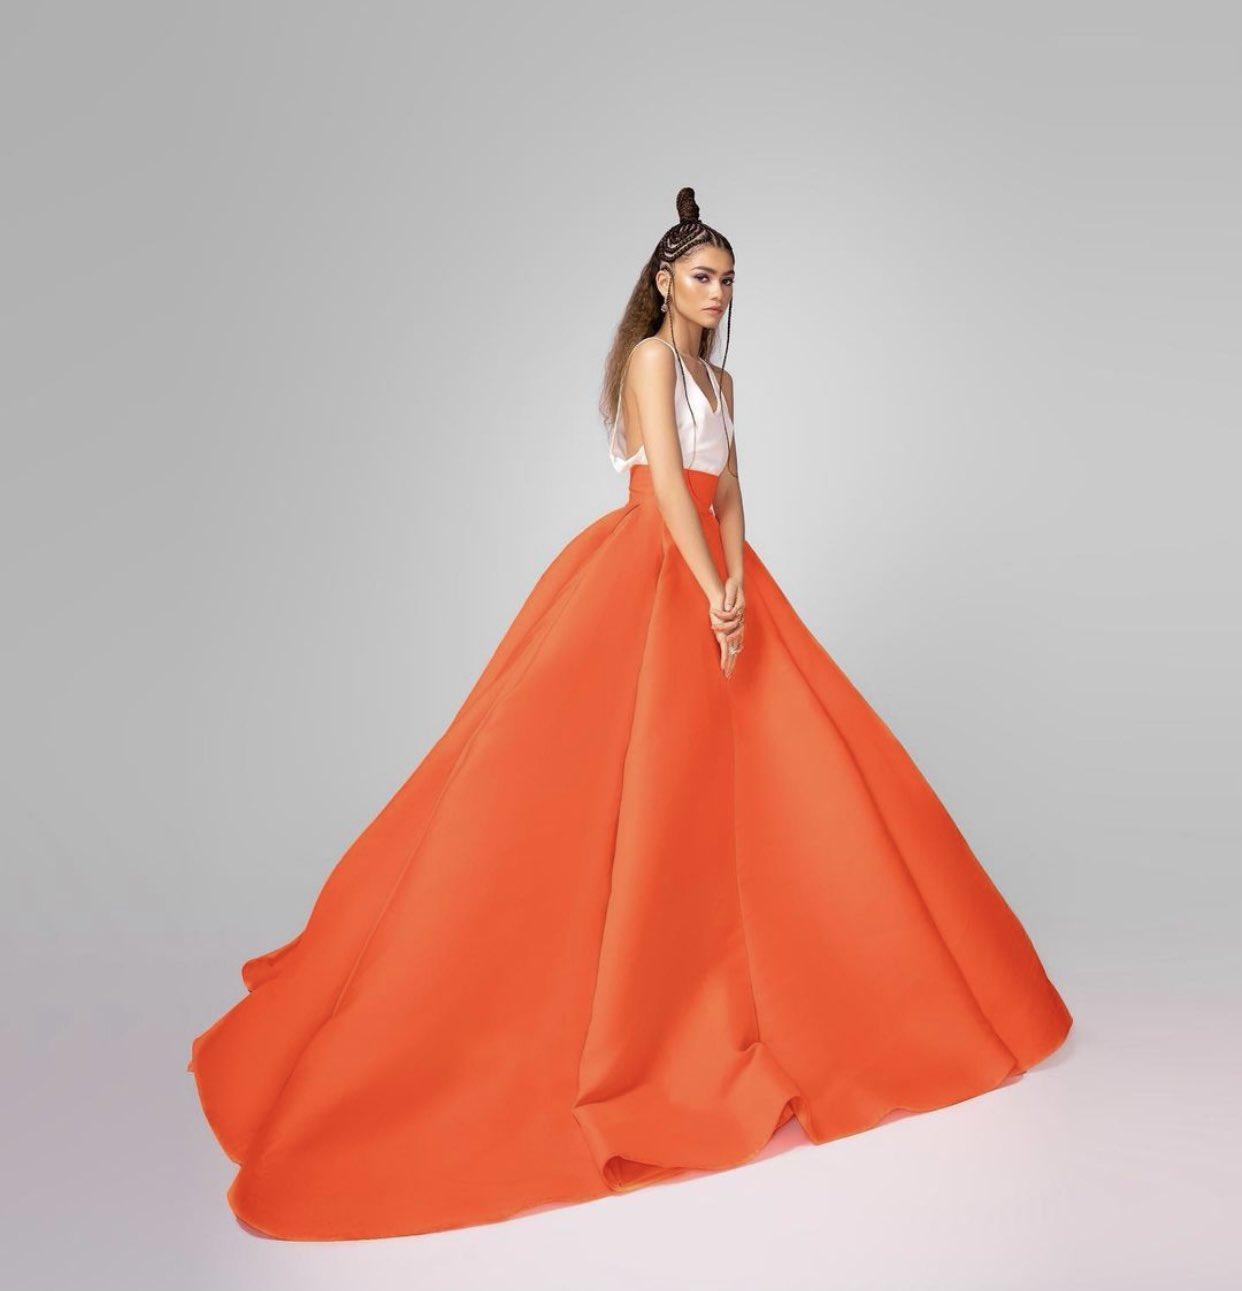 zendaya-in-in-valentino-haute-couture-2021-critics-choice-awards